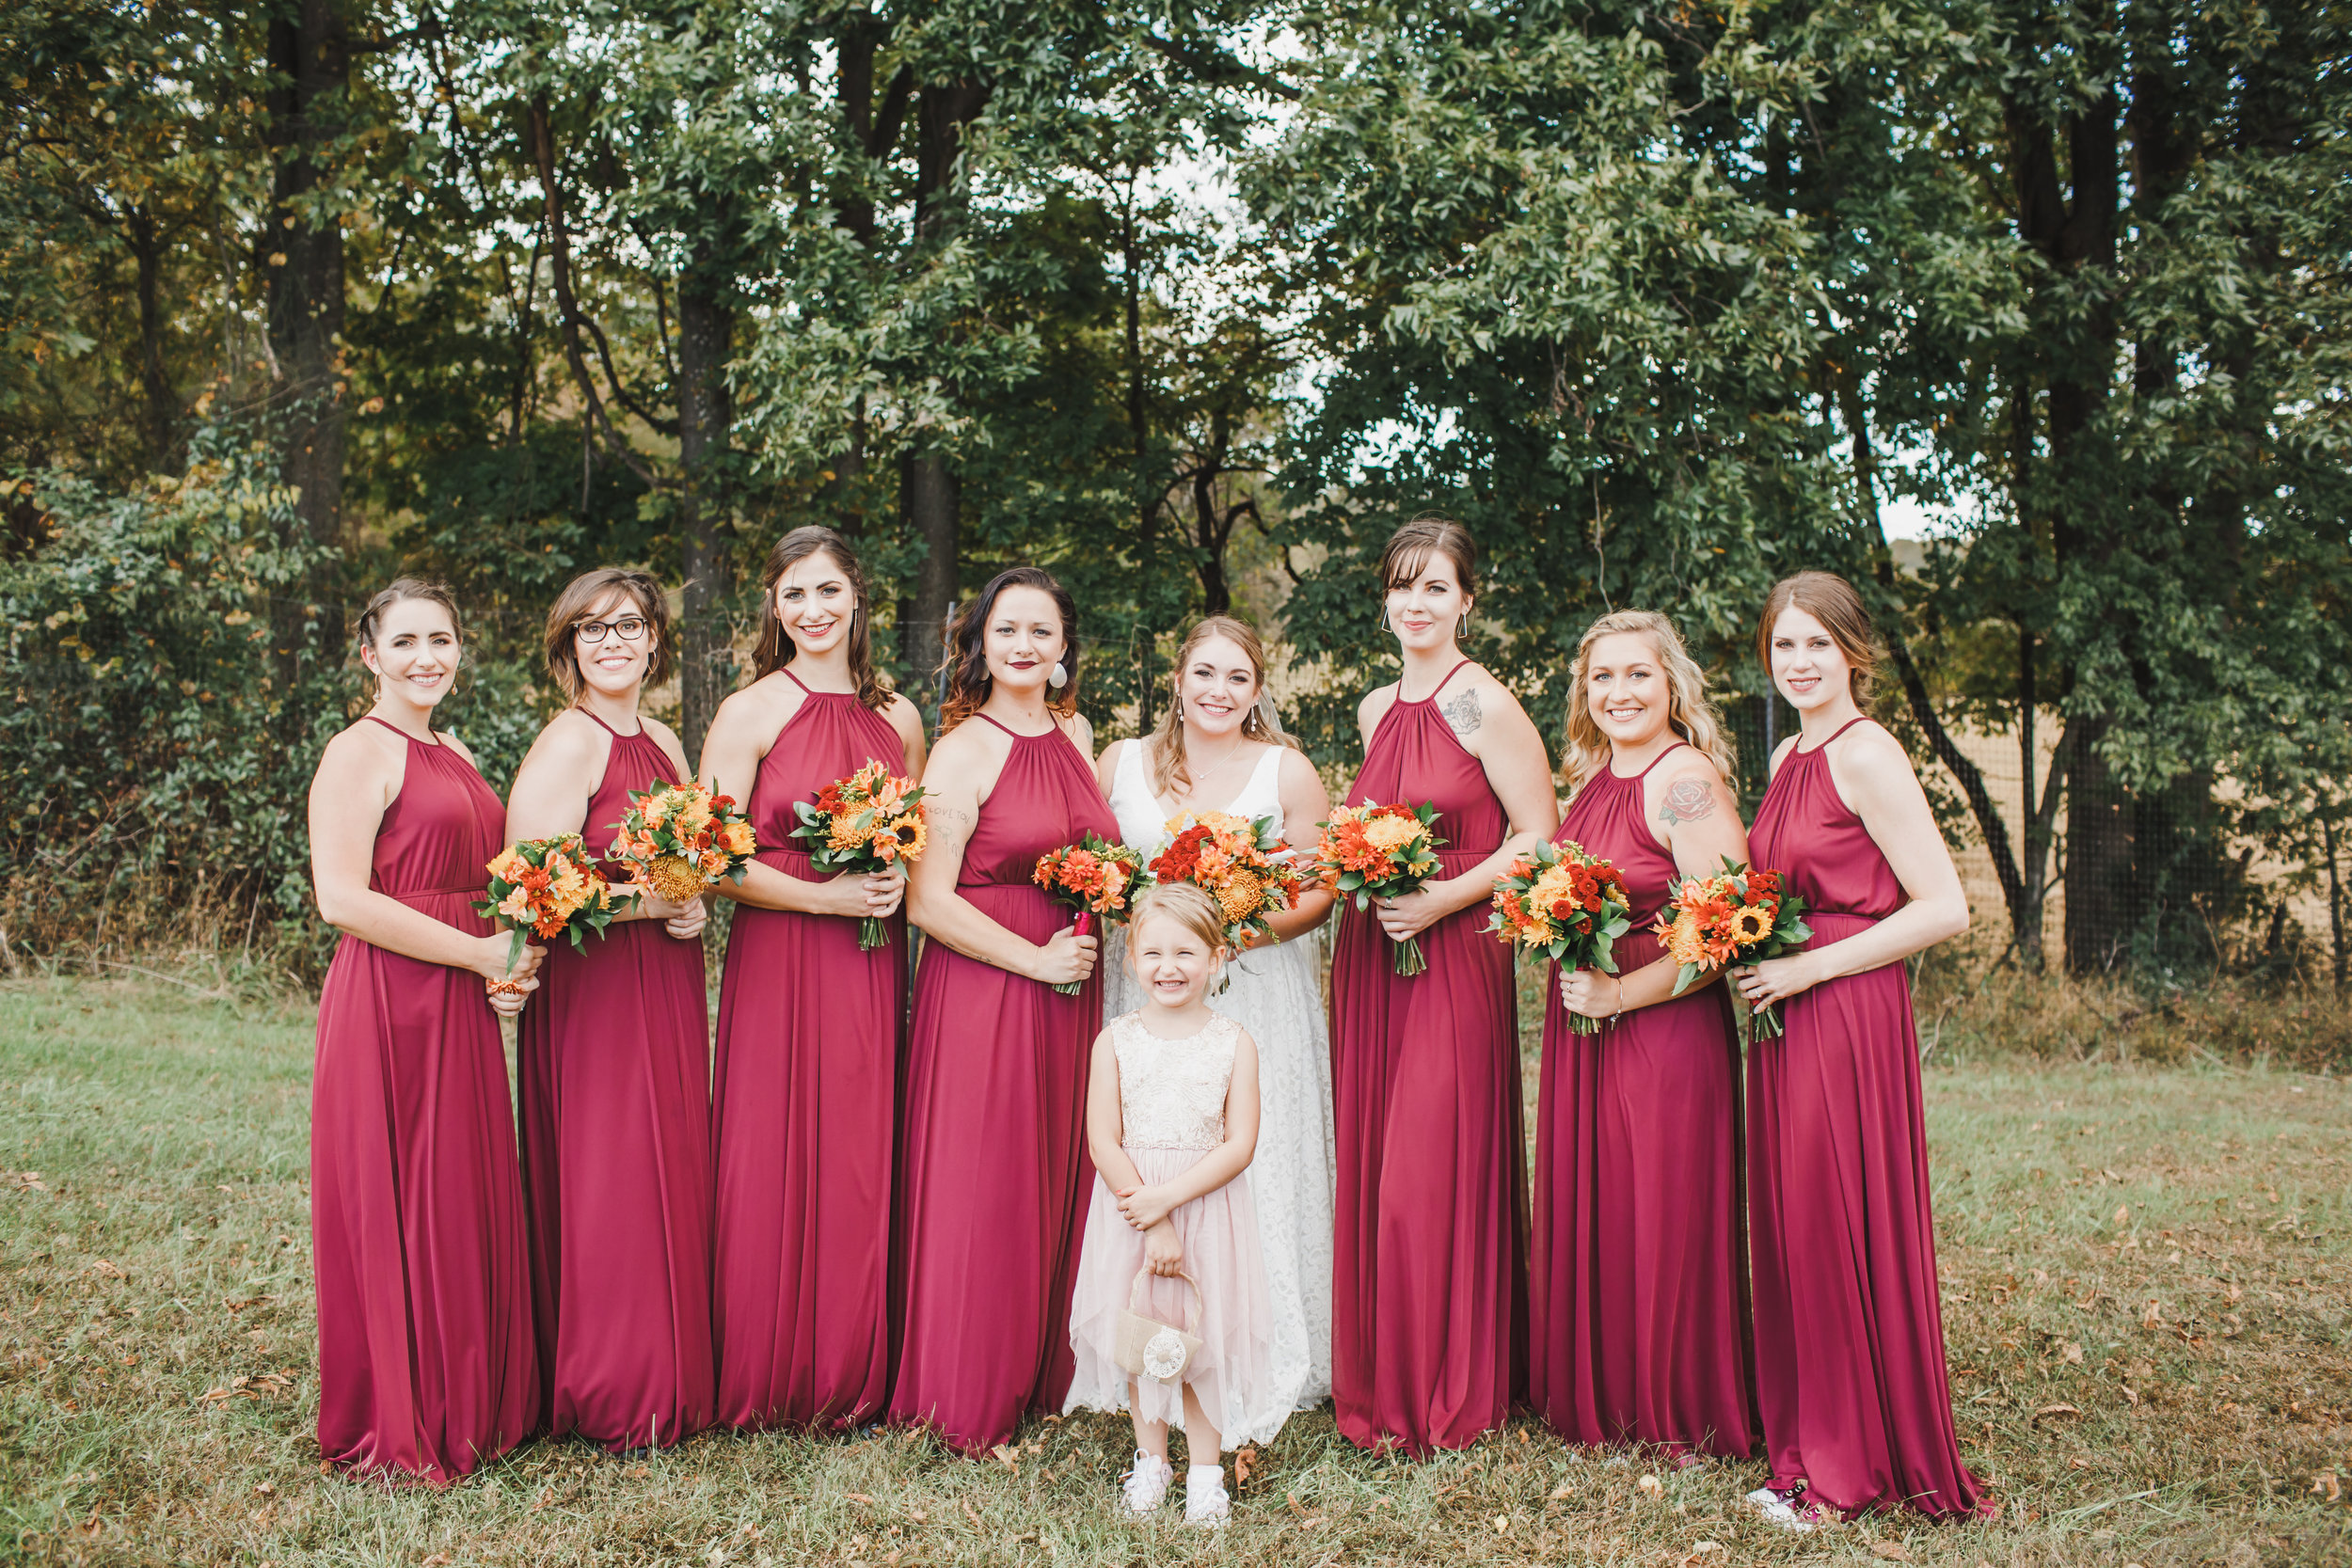 Fling - Virginia Wedding Photographer - Photography by Amy Nicole-255-10.jpg